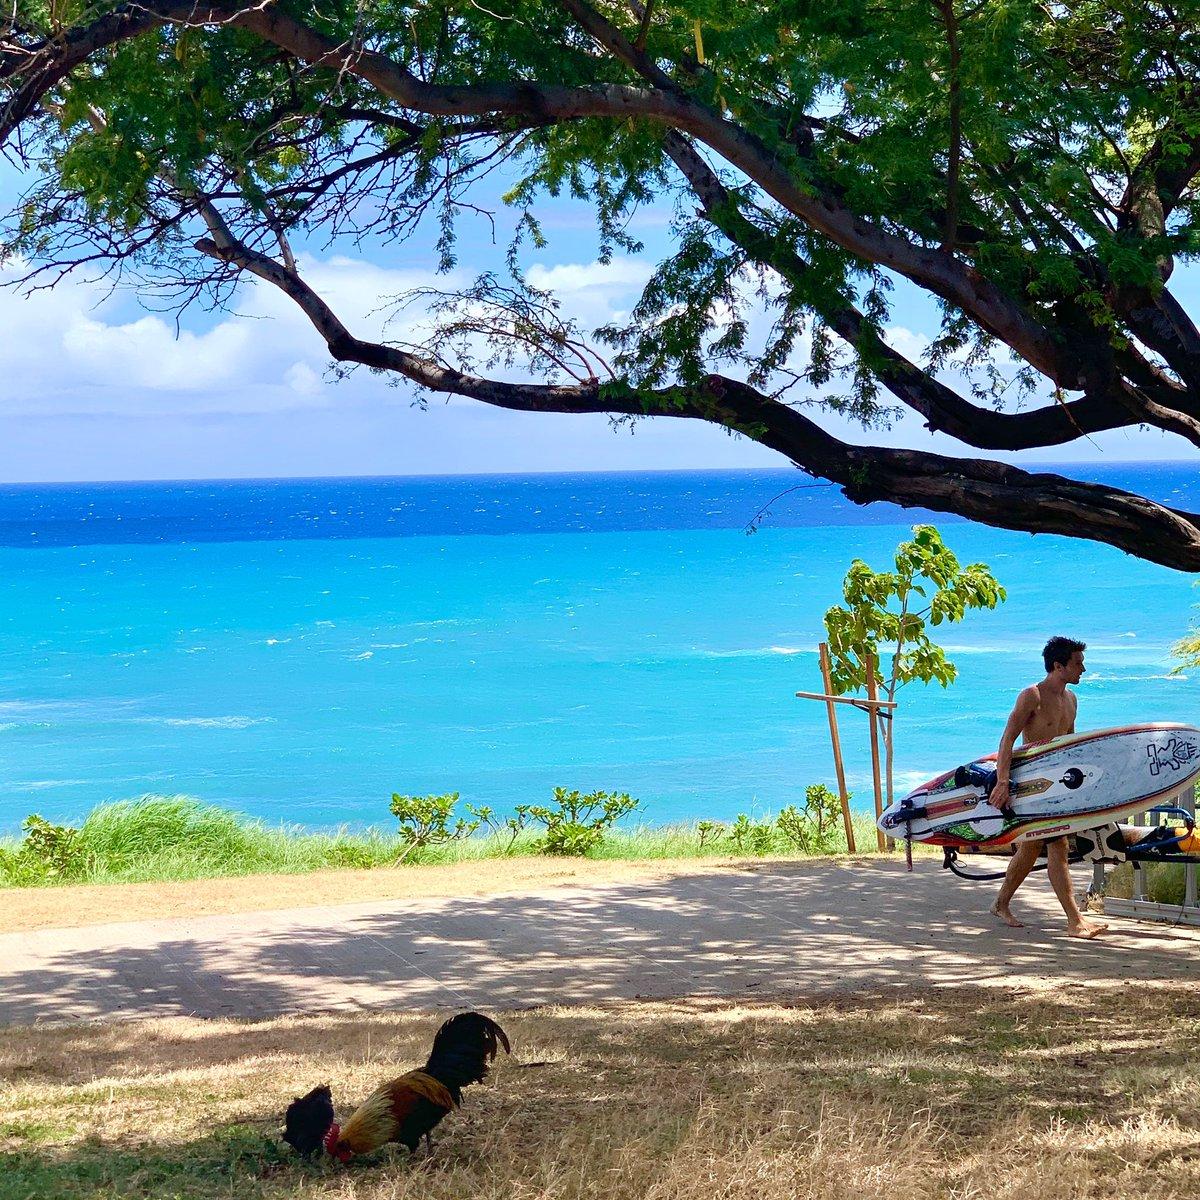 My view🐓🏄♂️💙  ニワトリと海?笑!  #surf #surfergirl #diamondheadbeach #hawaiilife #hawaii #hilife #lovehawaii #surfing #surflife #beachlife #beachday #islandlife #aloha #luckywelivehawaii #サーフィン #サーフィン女子 #ハワイ #ビーチライフ #ハワイライフ #ハワイ暮らし #海のある生活 https://t.co/RXWU3FNBdc